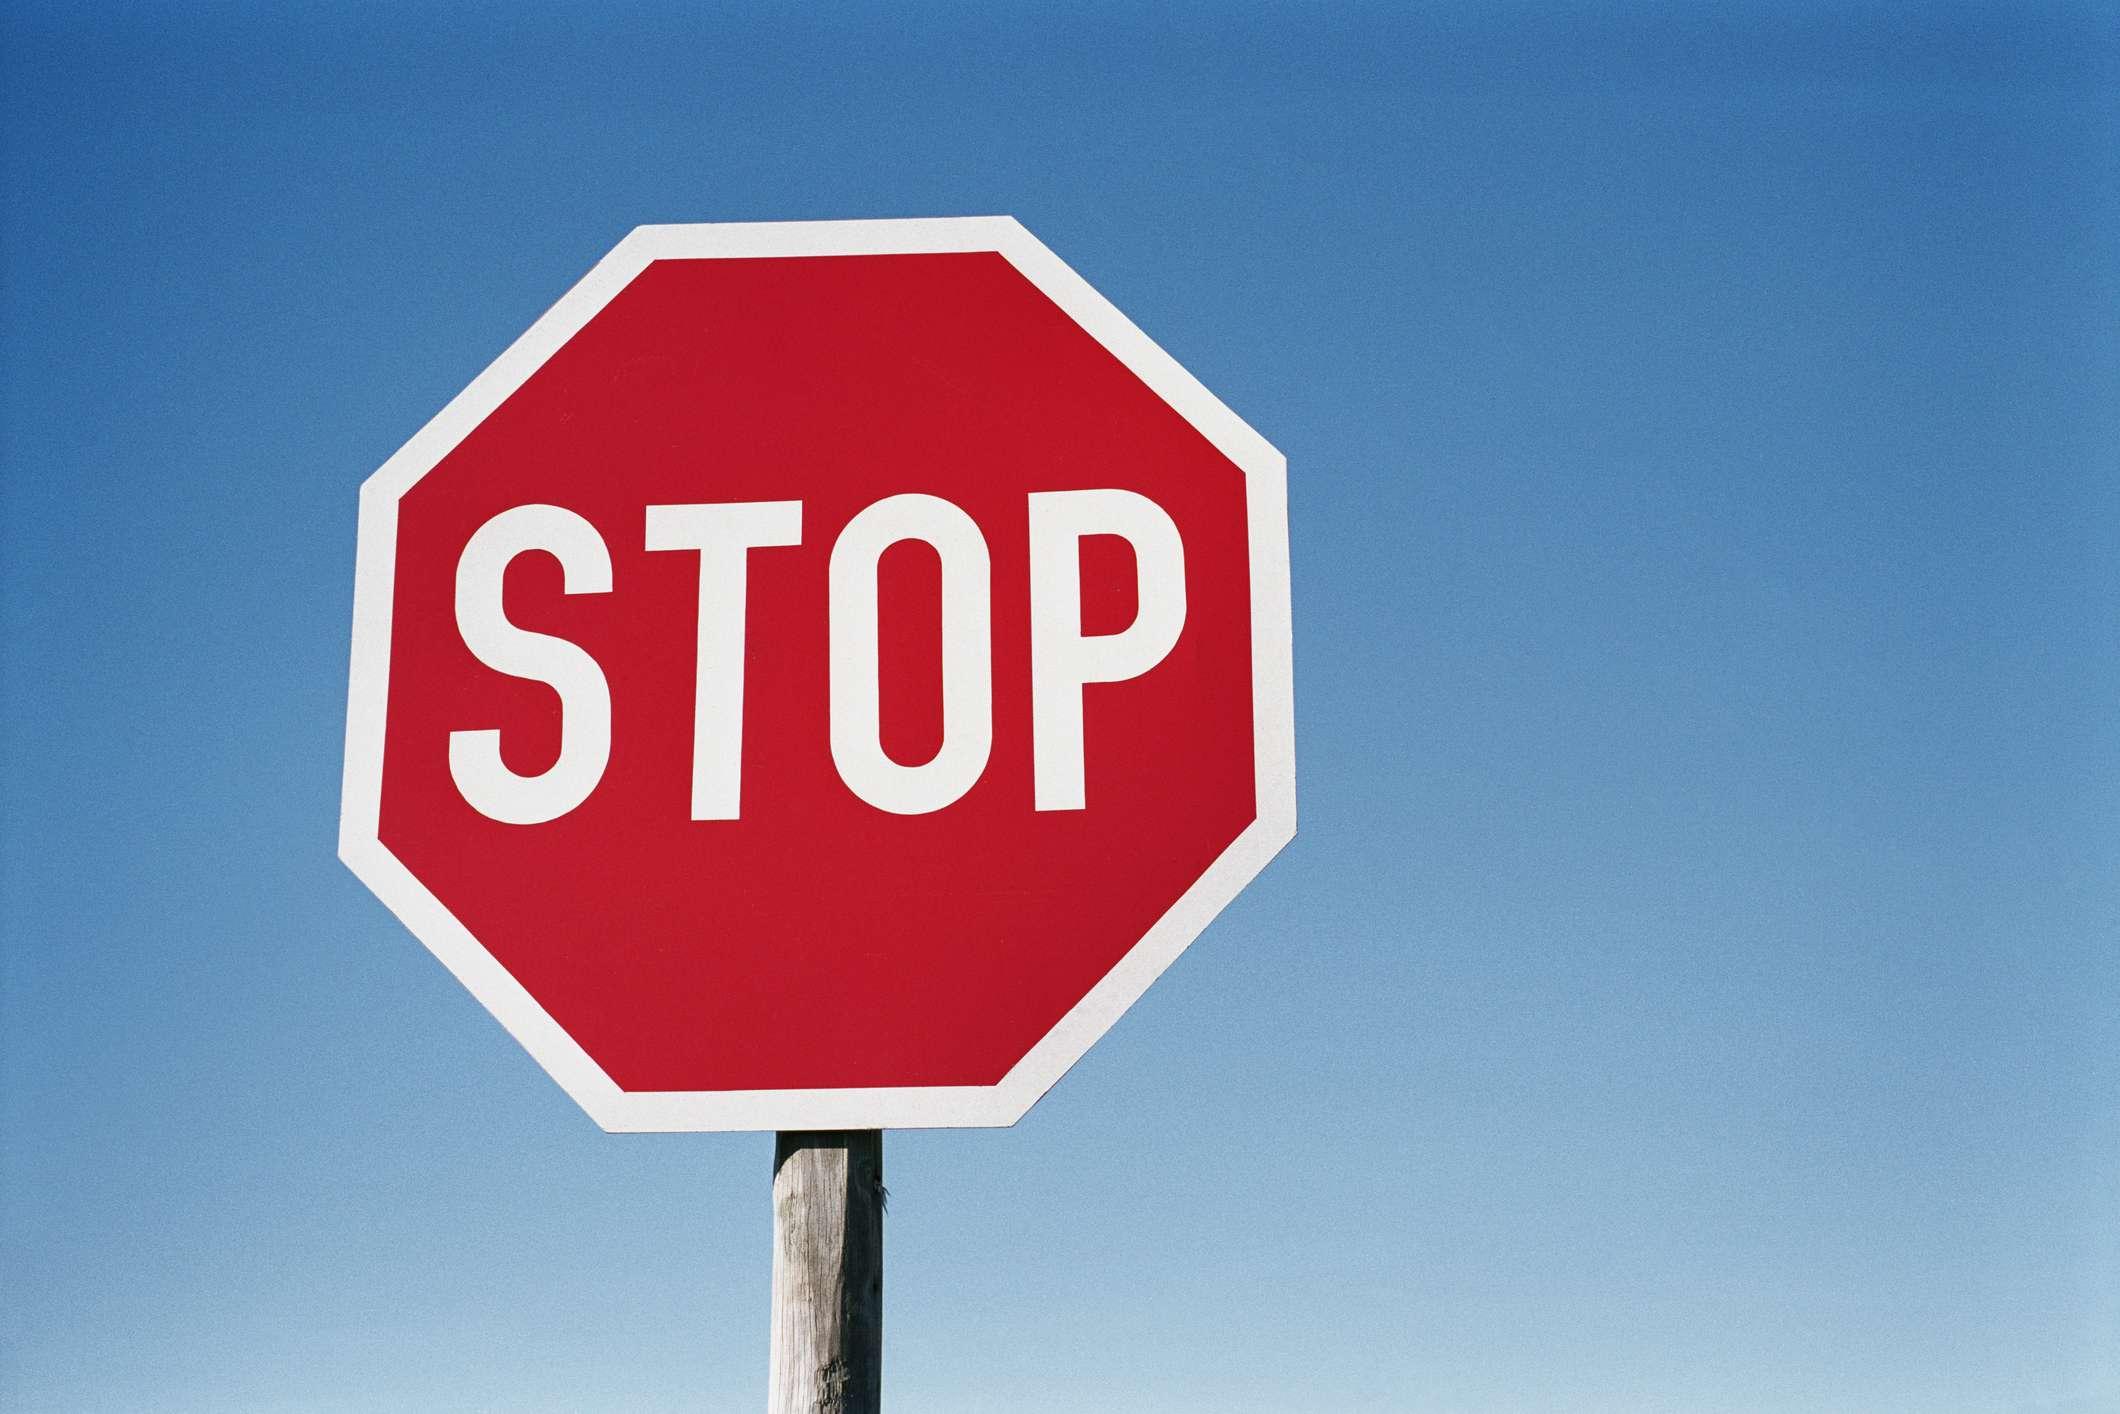 A street stop sign